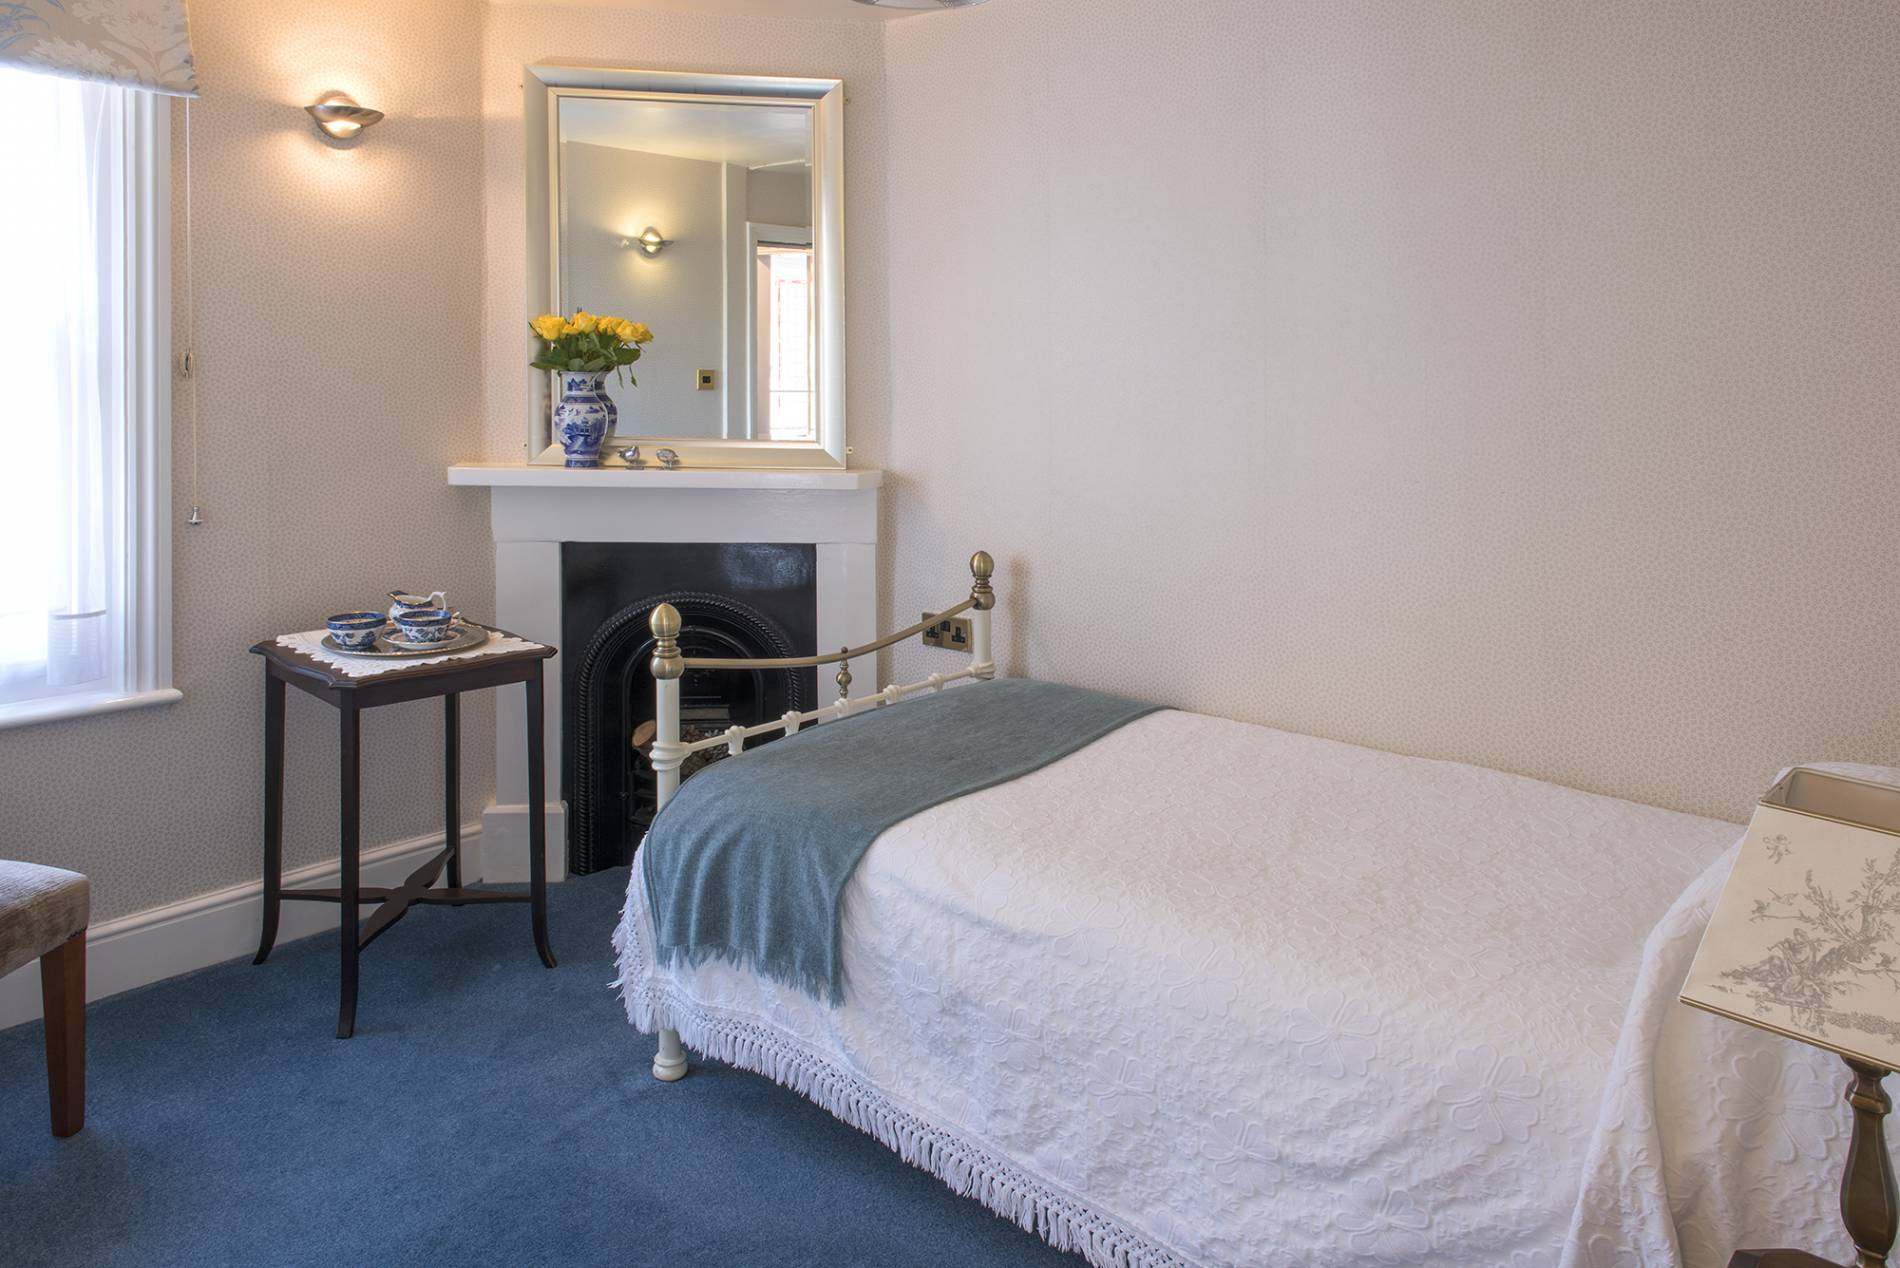 Yorke Lodge Bed and Breakfast Canterbury Kent single bedroom 0010